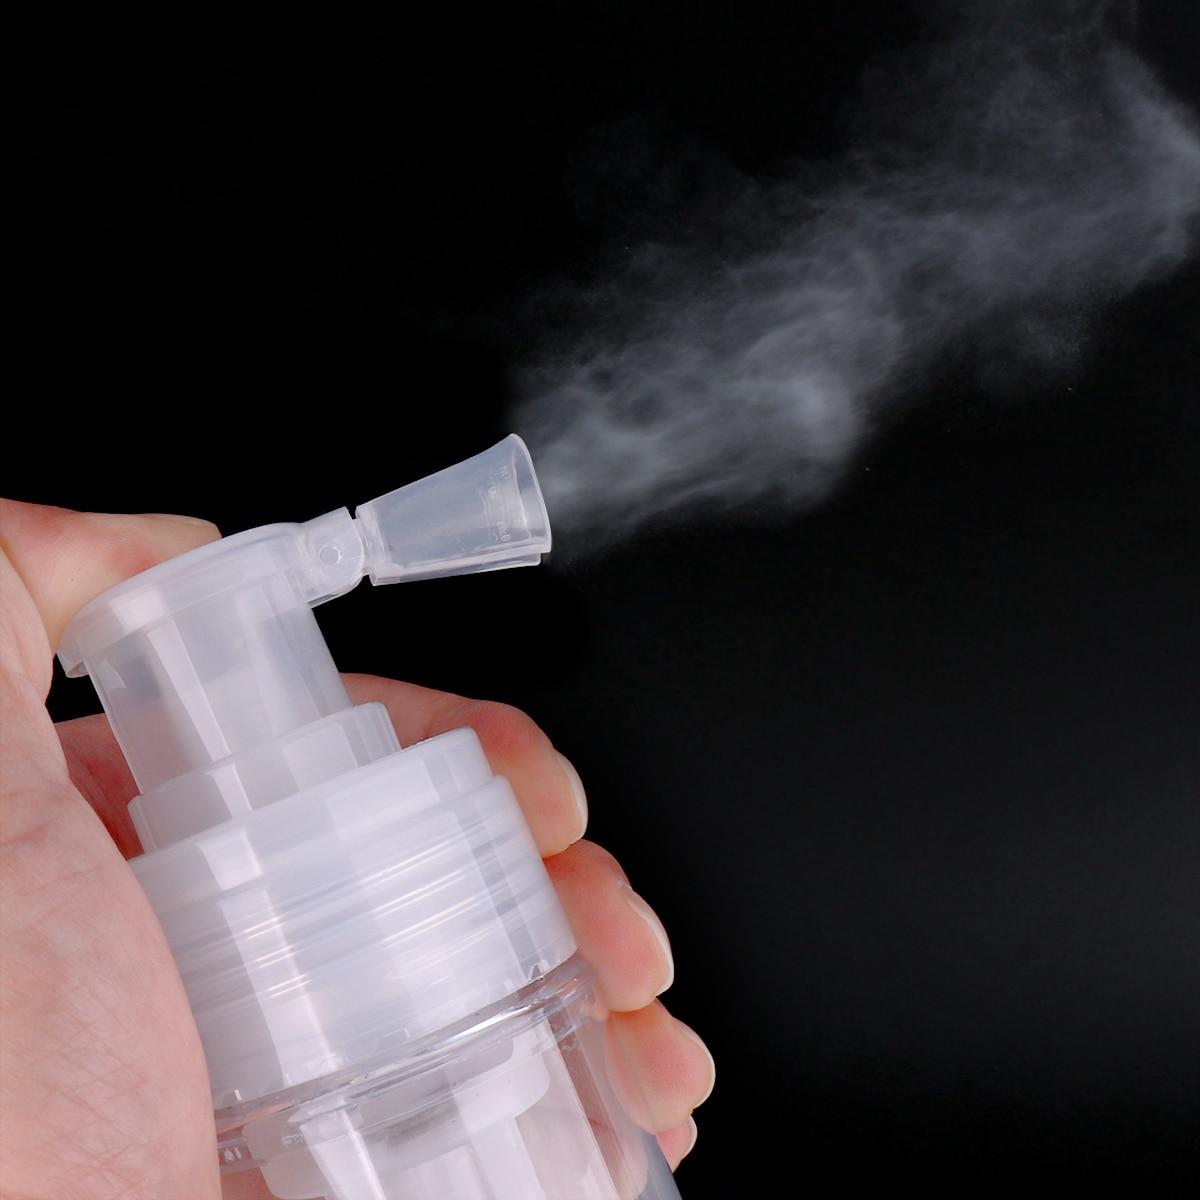 180ML Dismountable Travel Powder Spray Bottle PET Material Cosmetics Bottles Transparent Dry Powder Spray Bottle Dropshipping